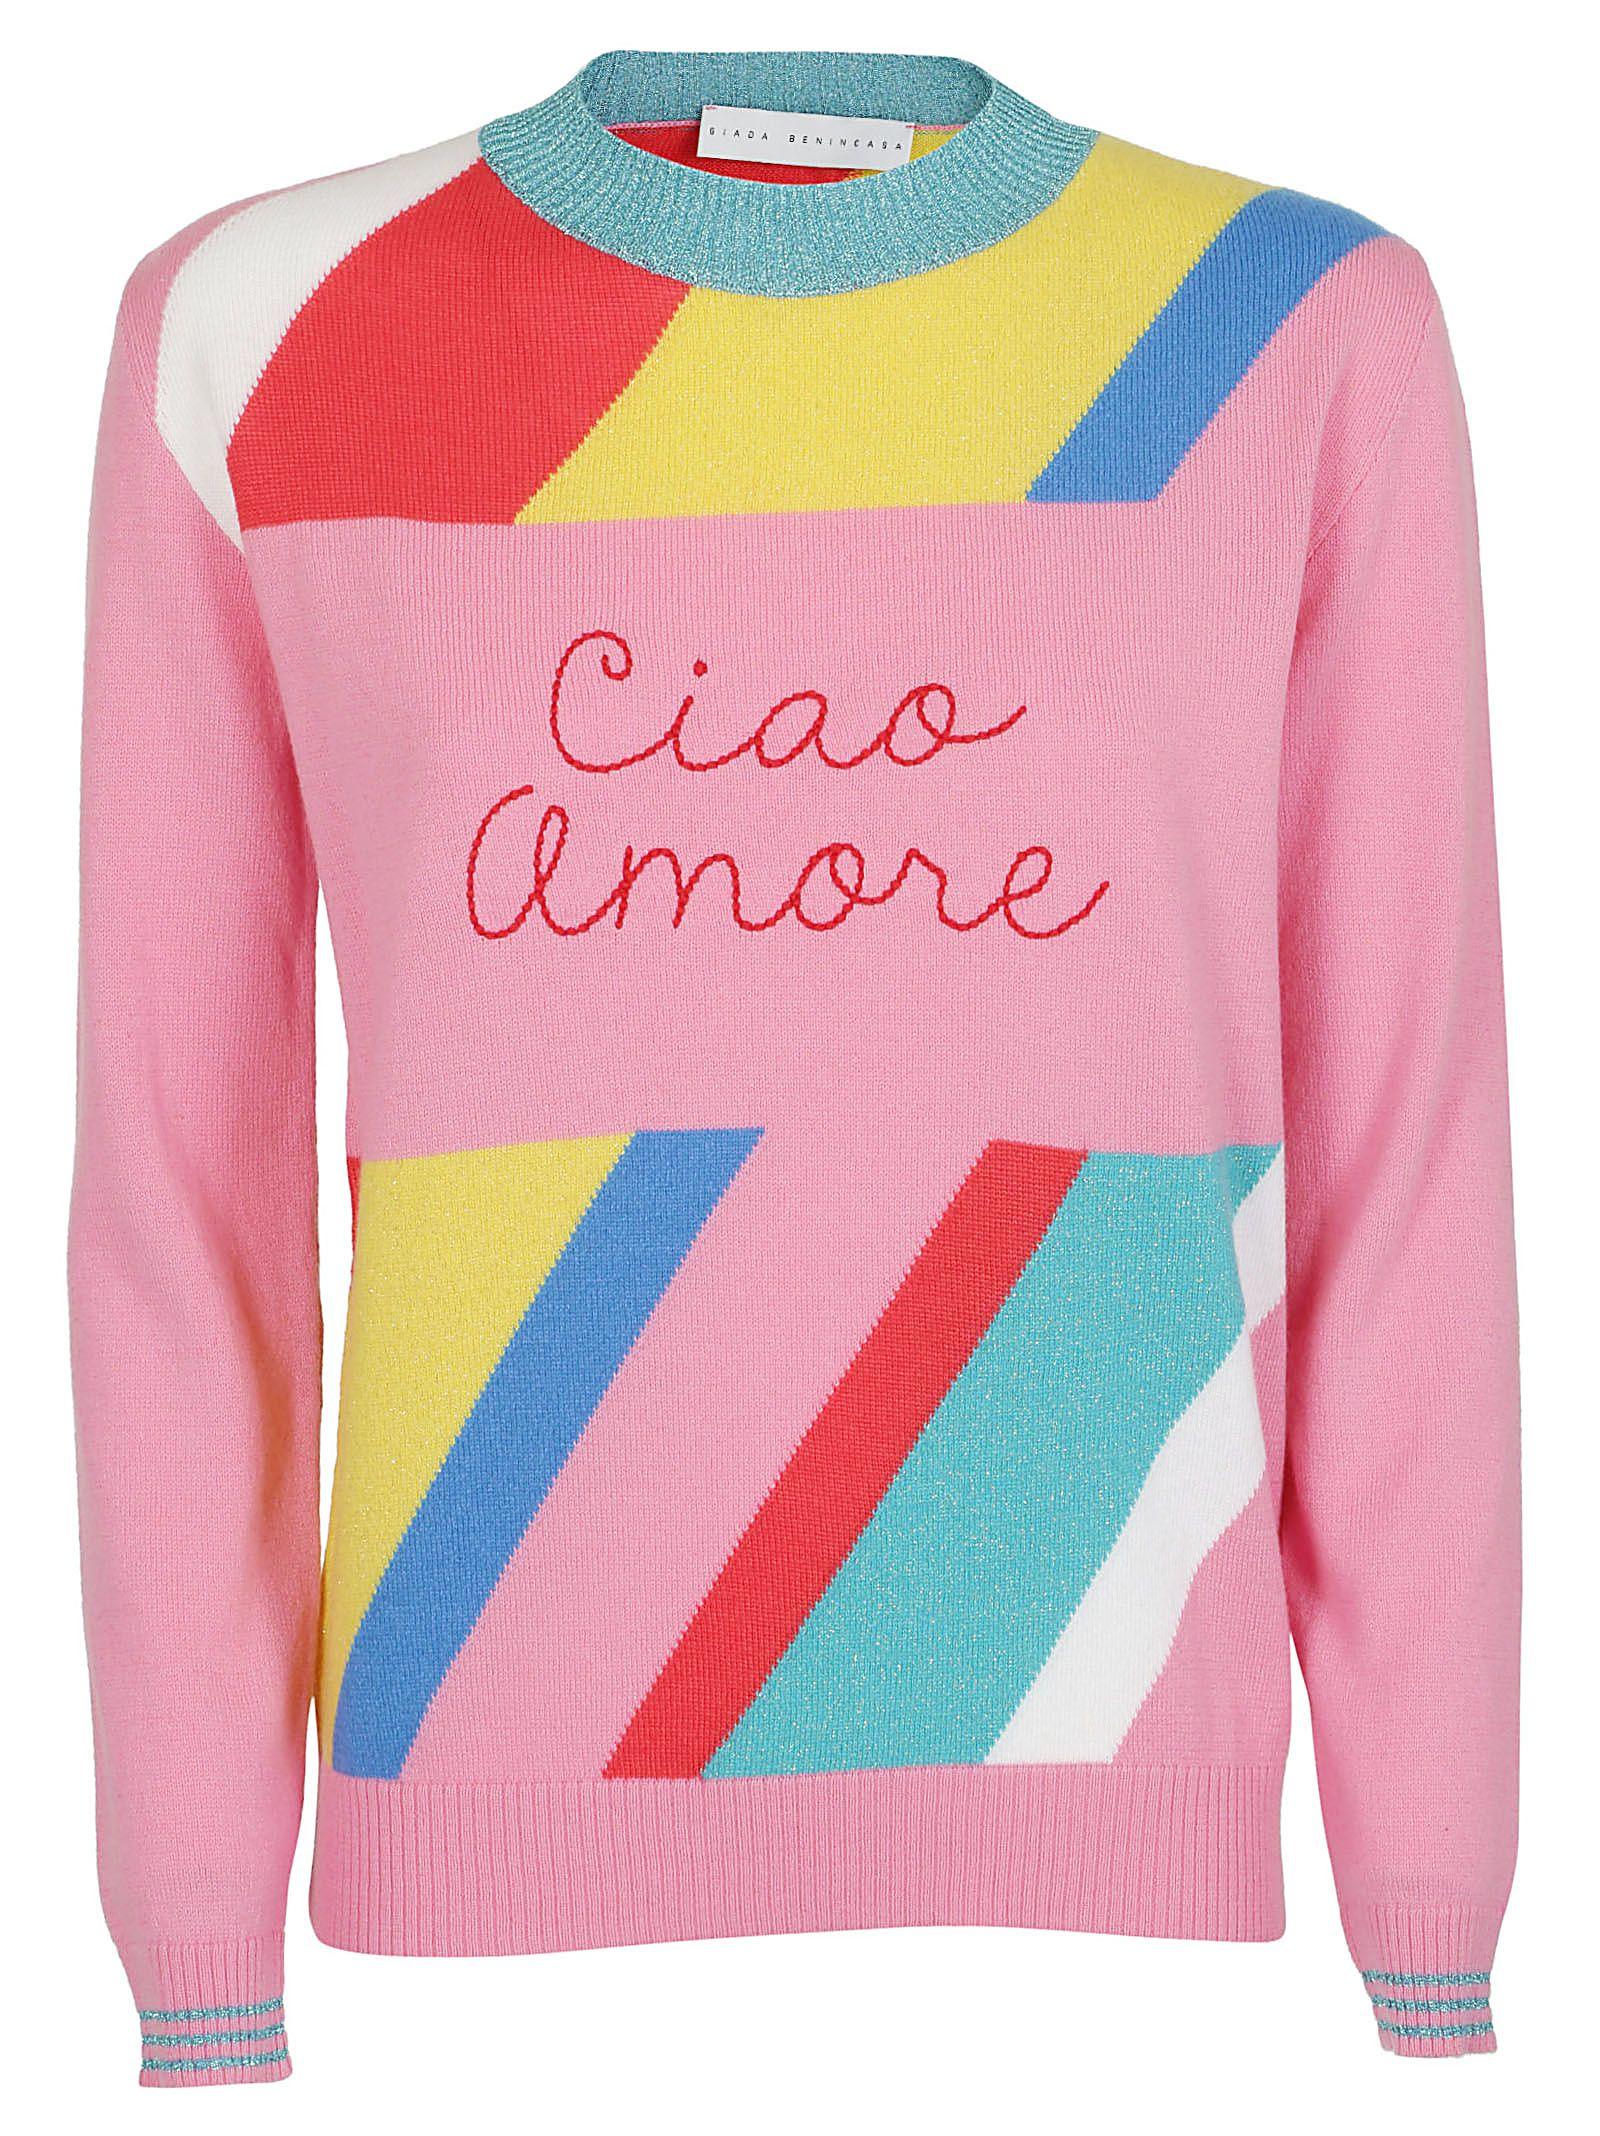 Giada Benincasa Giada Benincasa Ciao Amore Jumper Pink 10845081